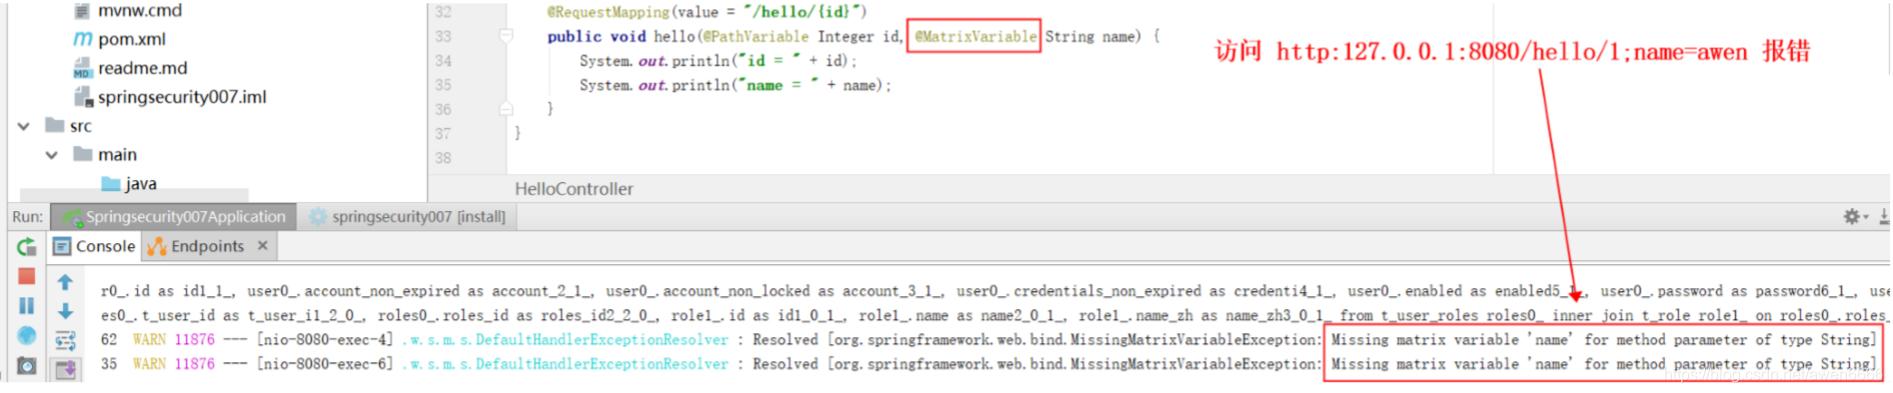 Missing matrix variable 'name' for method parameter of type String【解决办法】插图